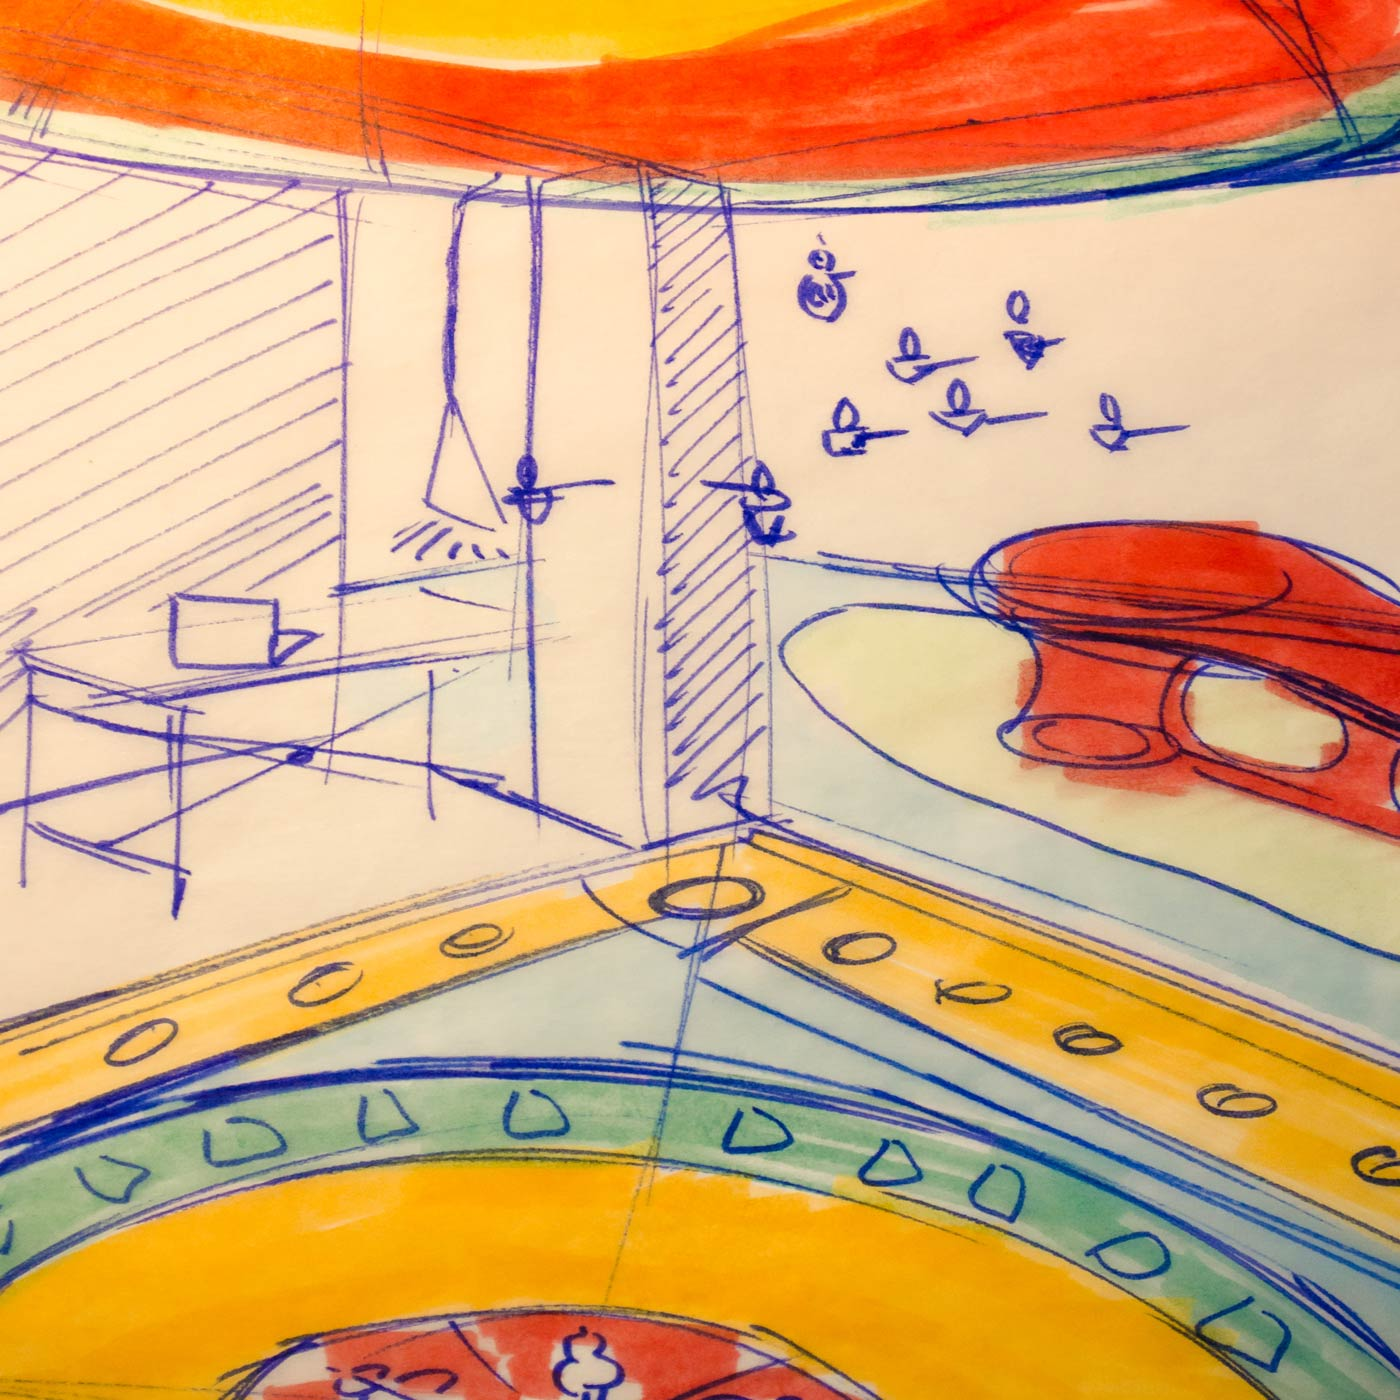 Scenography 02 by WACH designstudio for Alusi Ephemeral Art Atelier in Berlin Kreuzberg